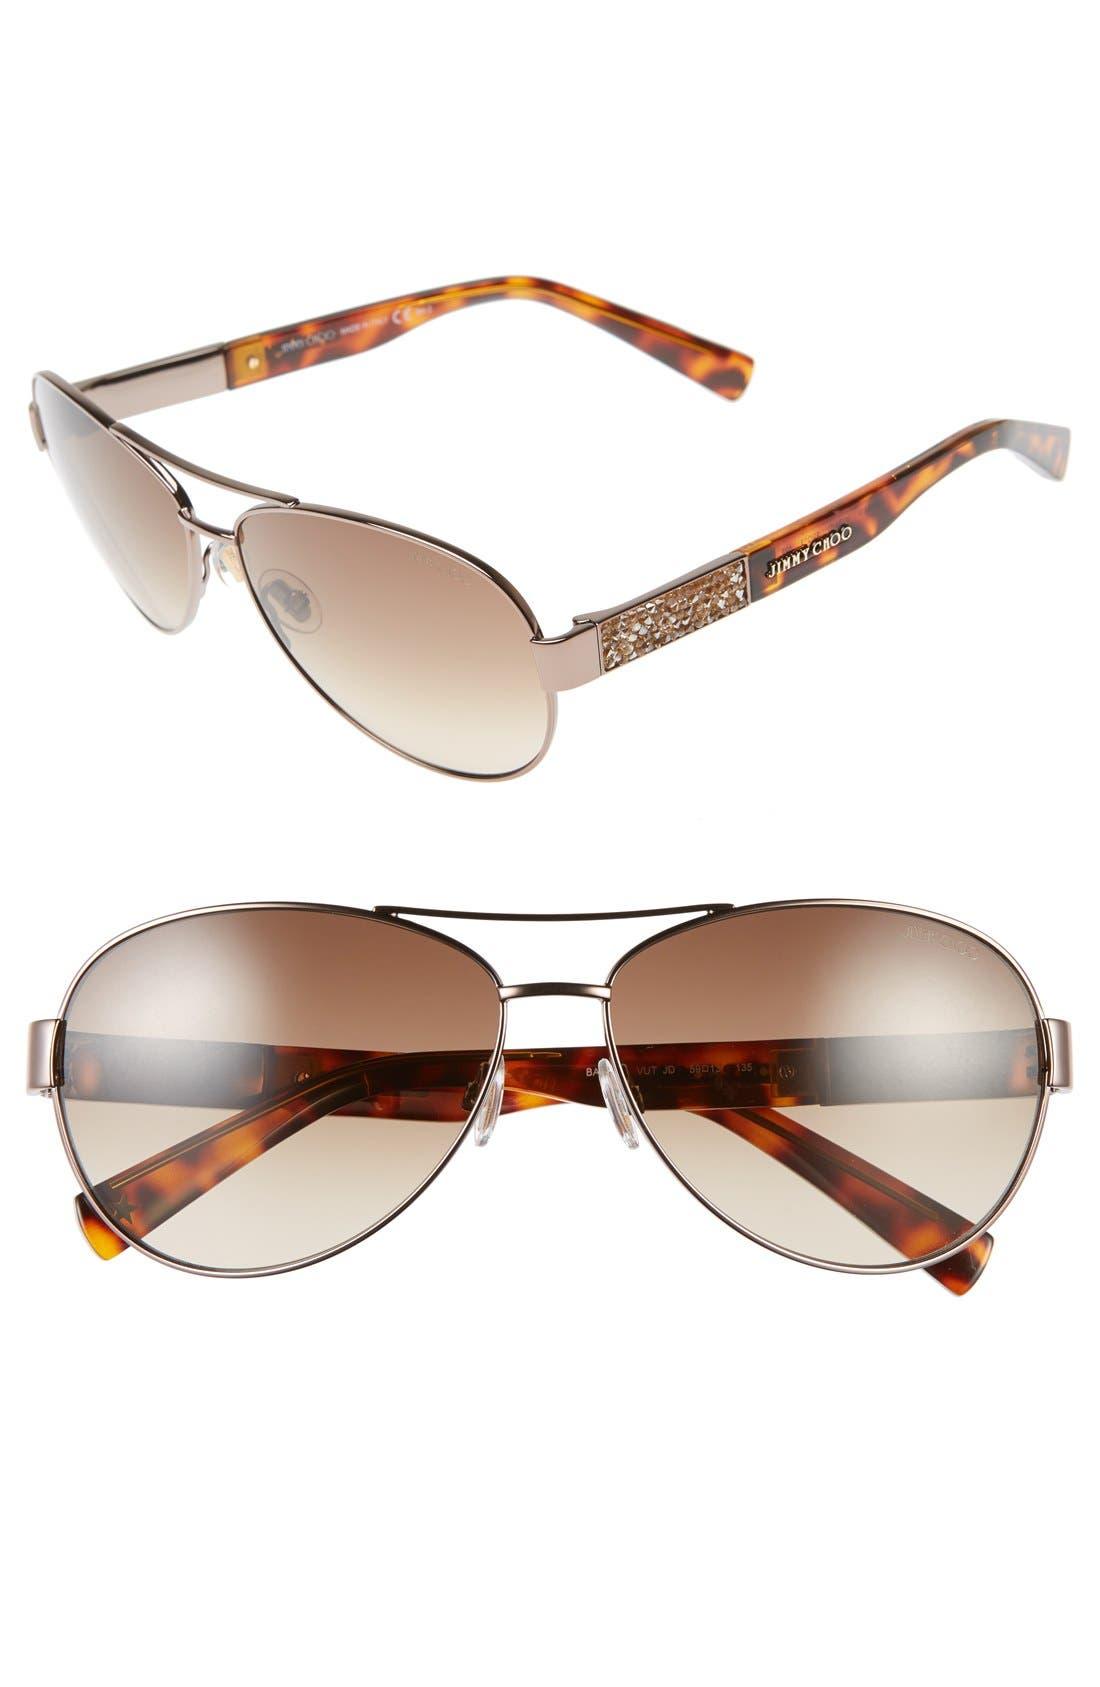 JIMMY CHOO 'Babas' 59mm Aviator Sunglasses, Main, color, 200